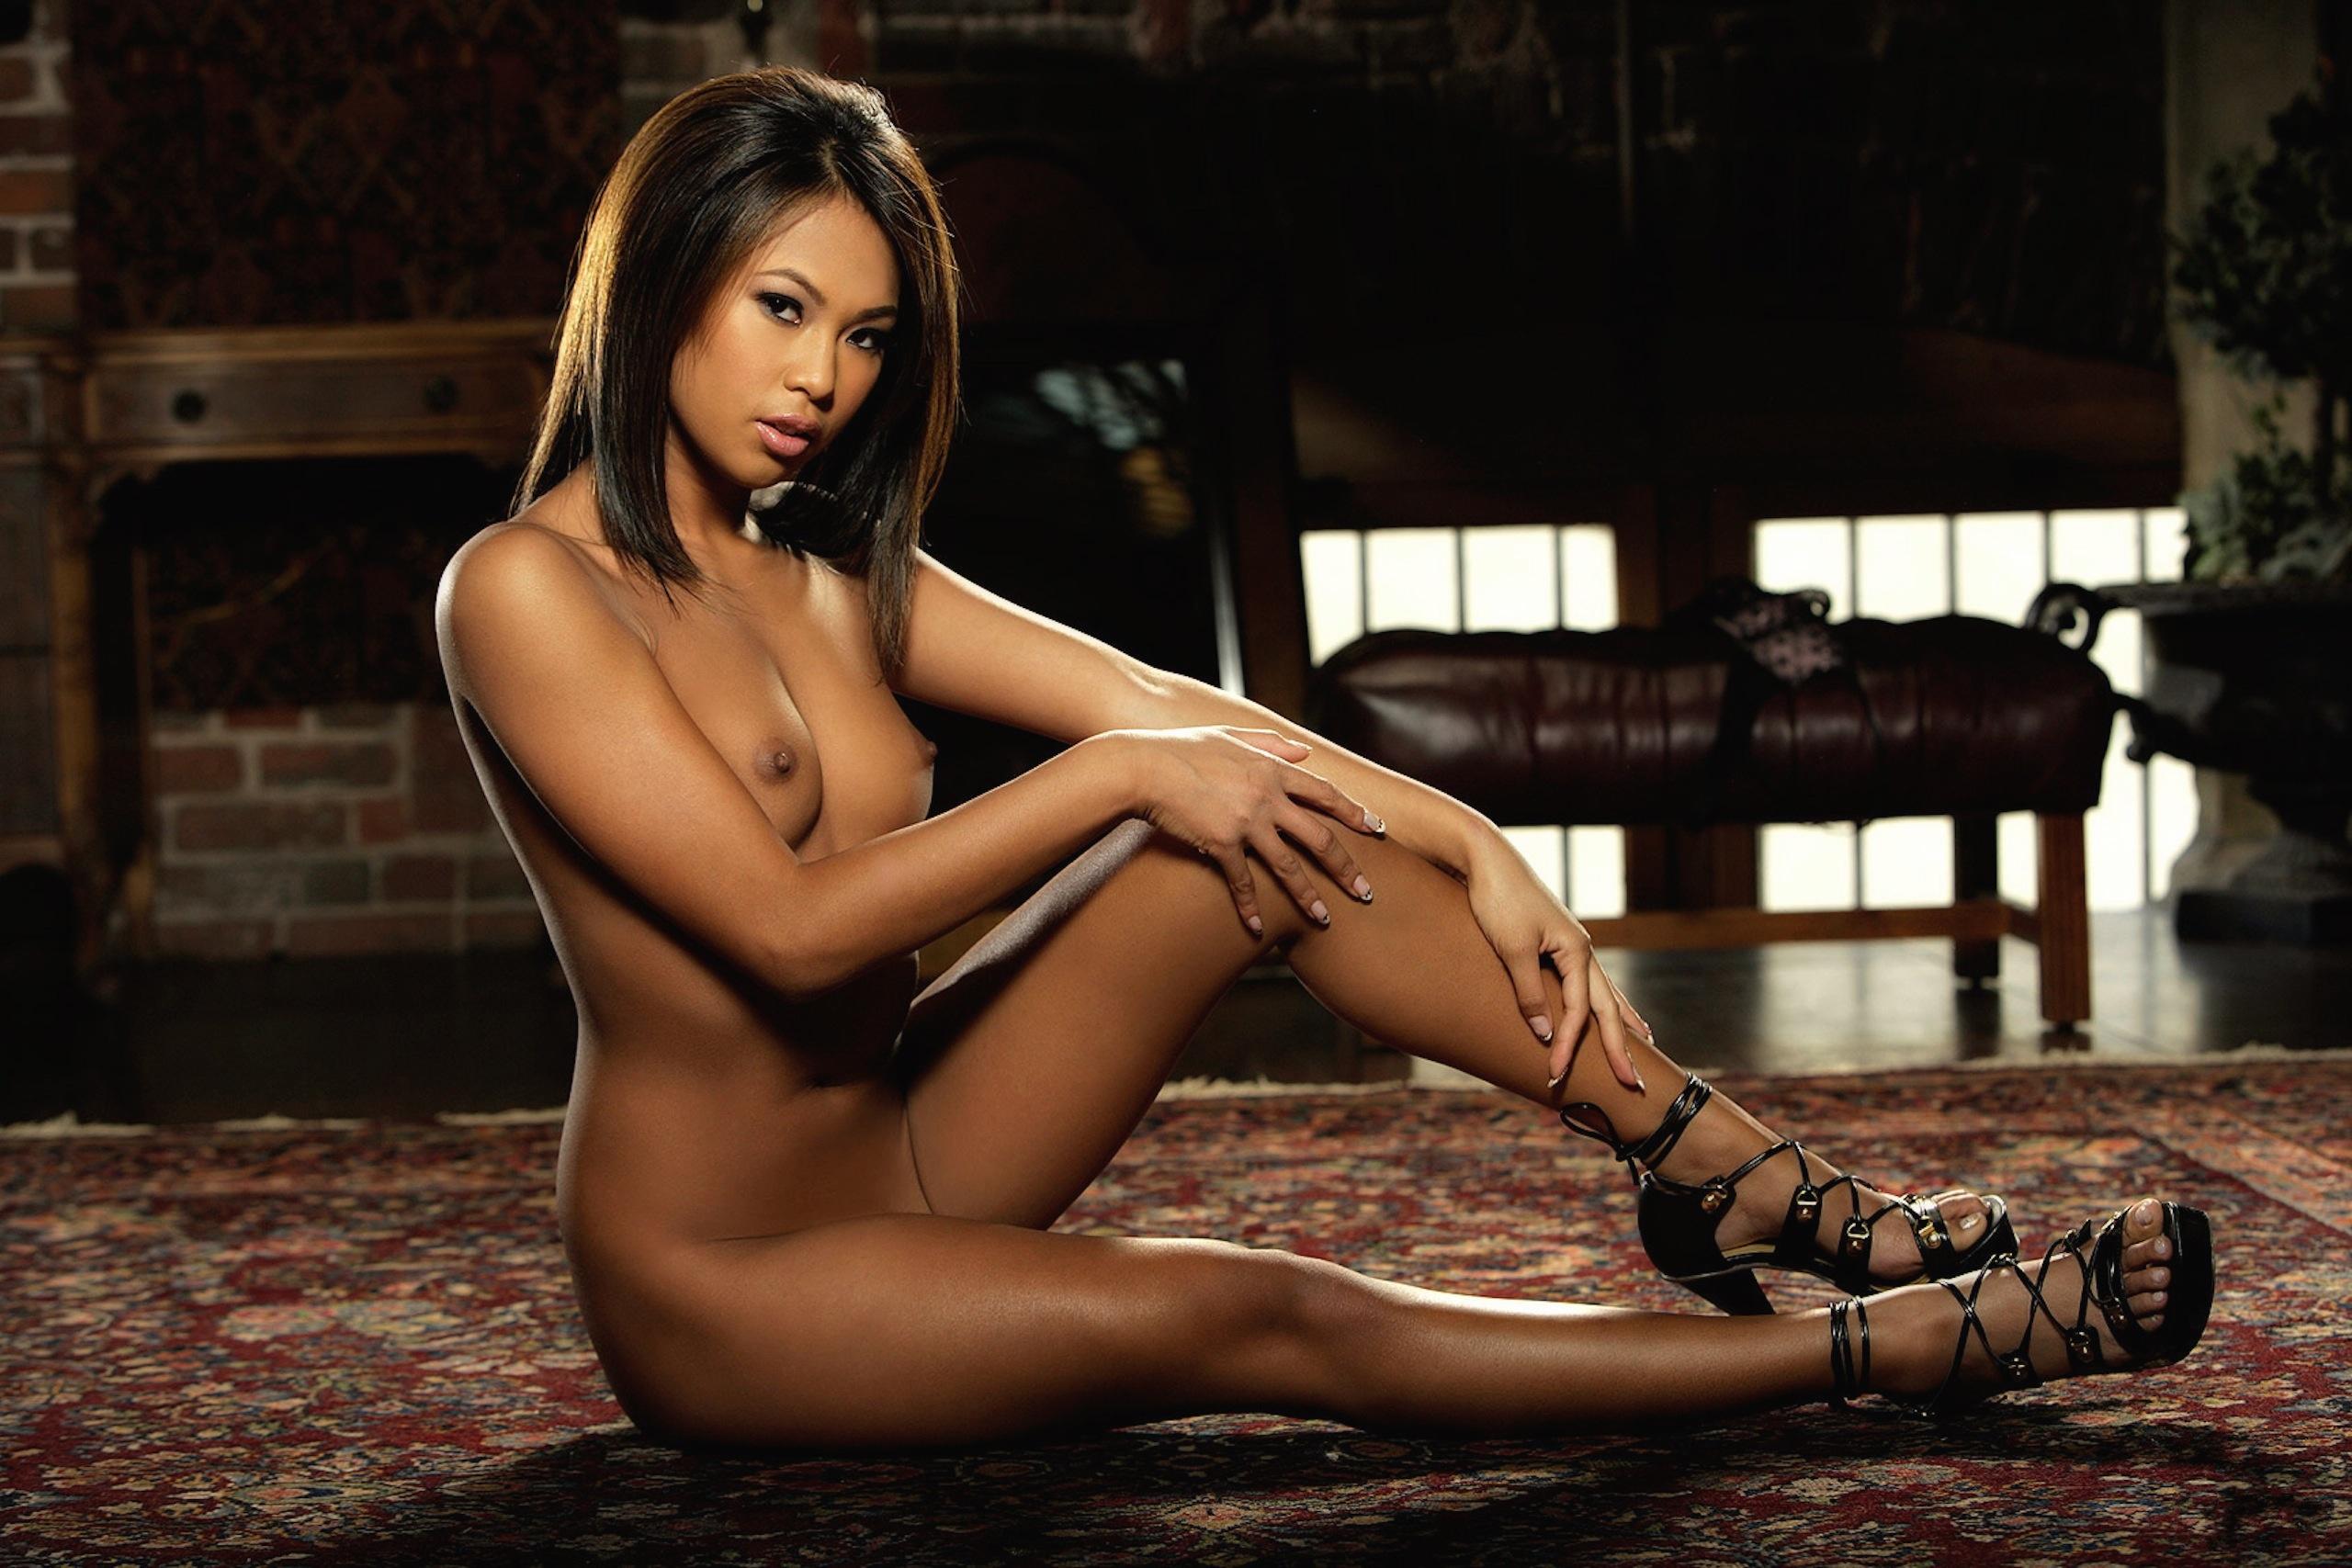 Секси азиатки картинки 17 фотография